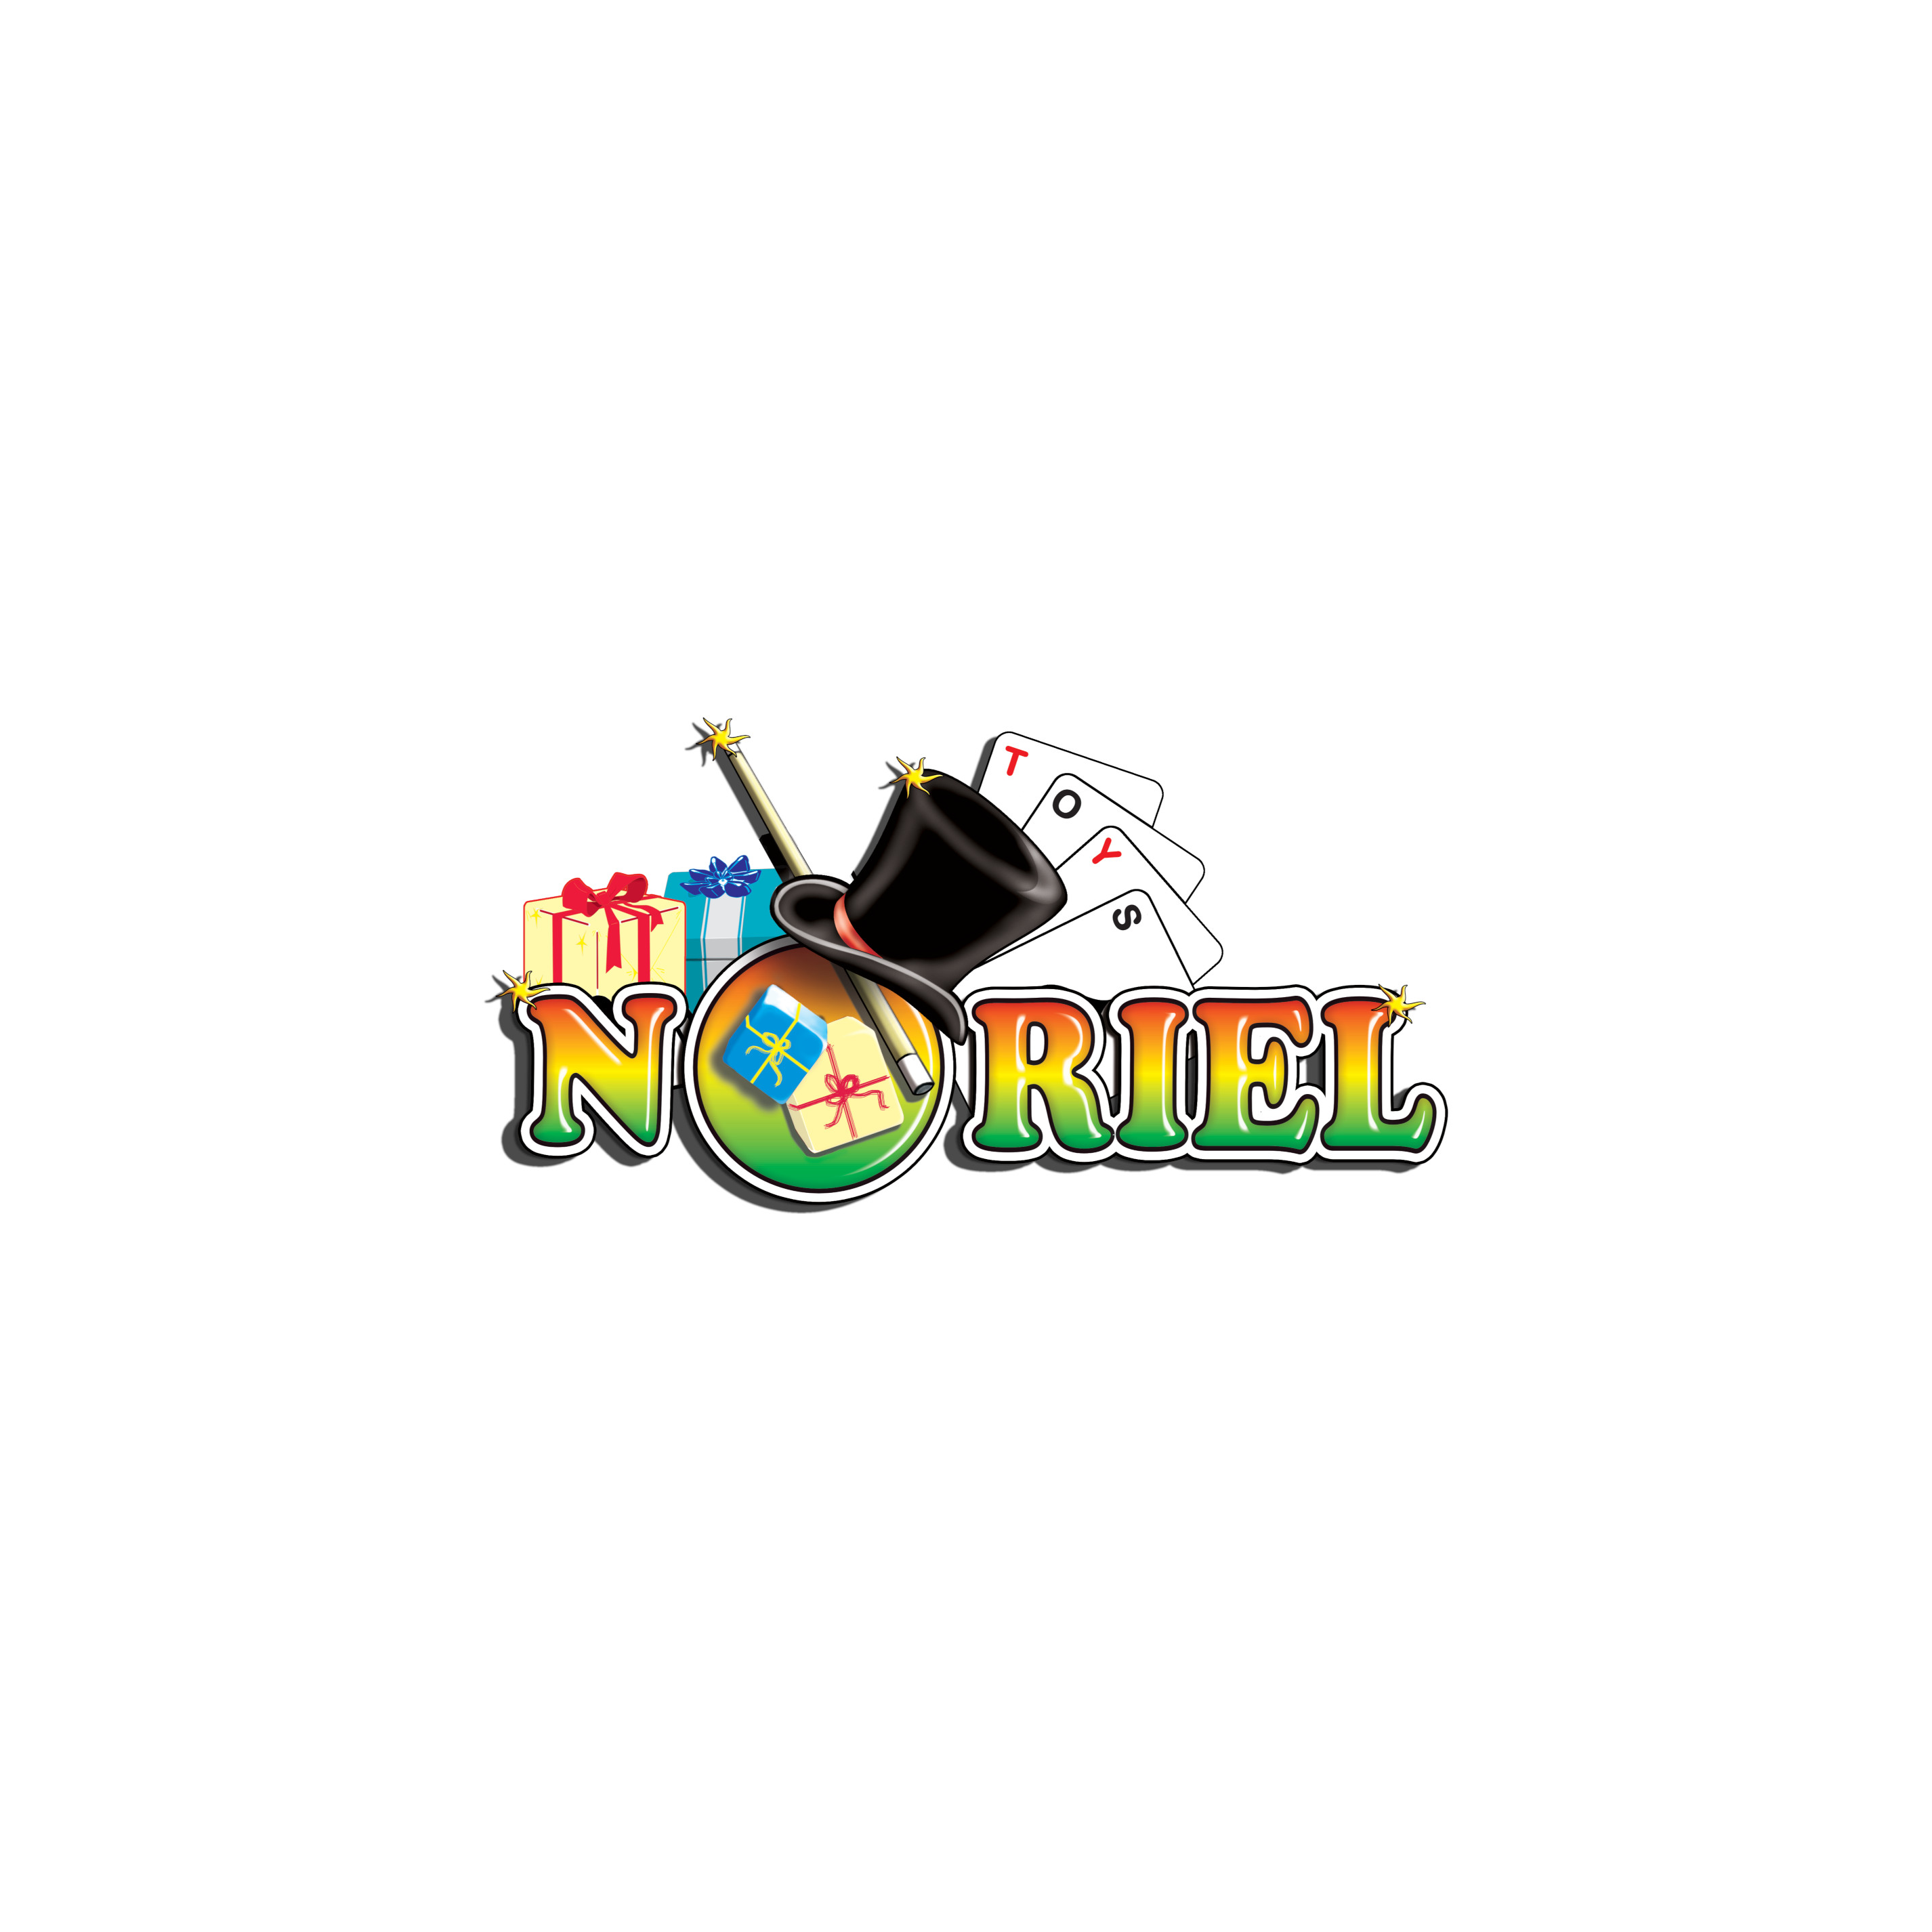 Tricicleta copii Basic Rosie Jr.Kids SM-JR-911B_ROSIE